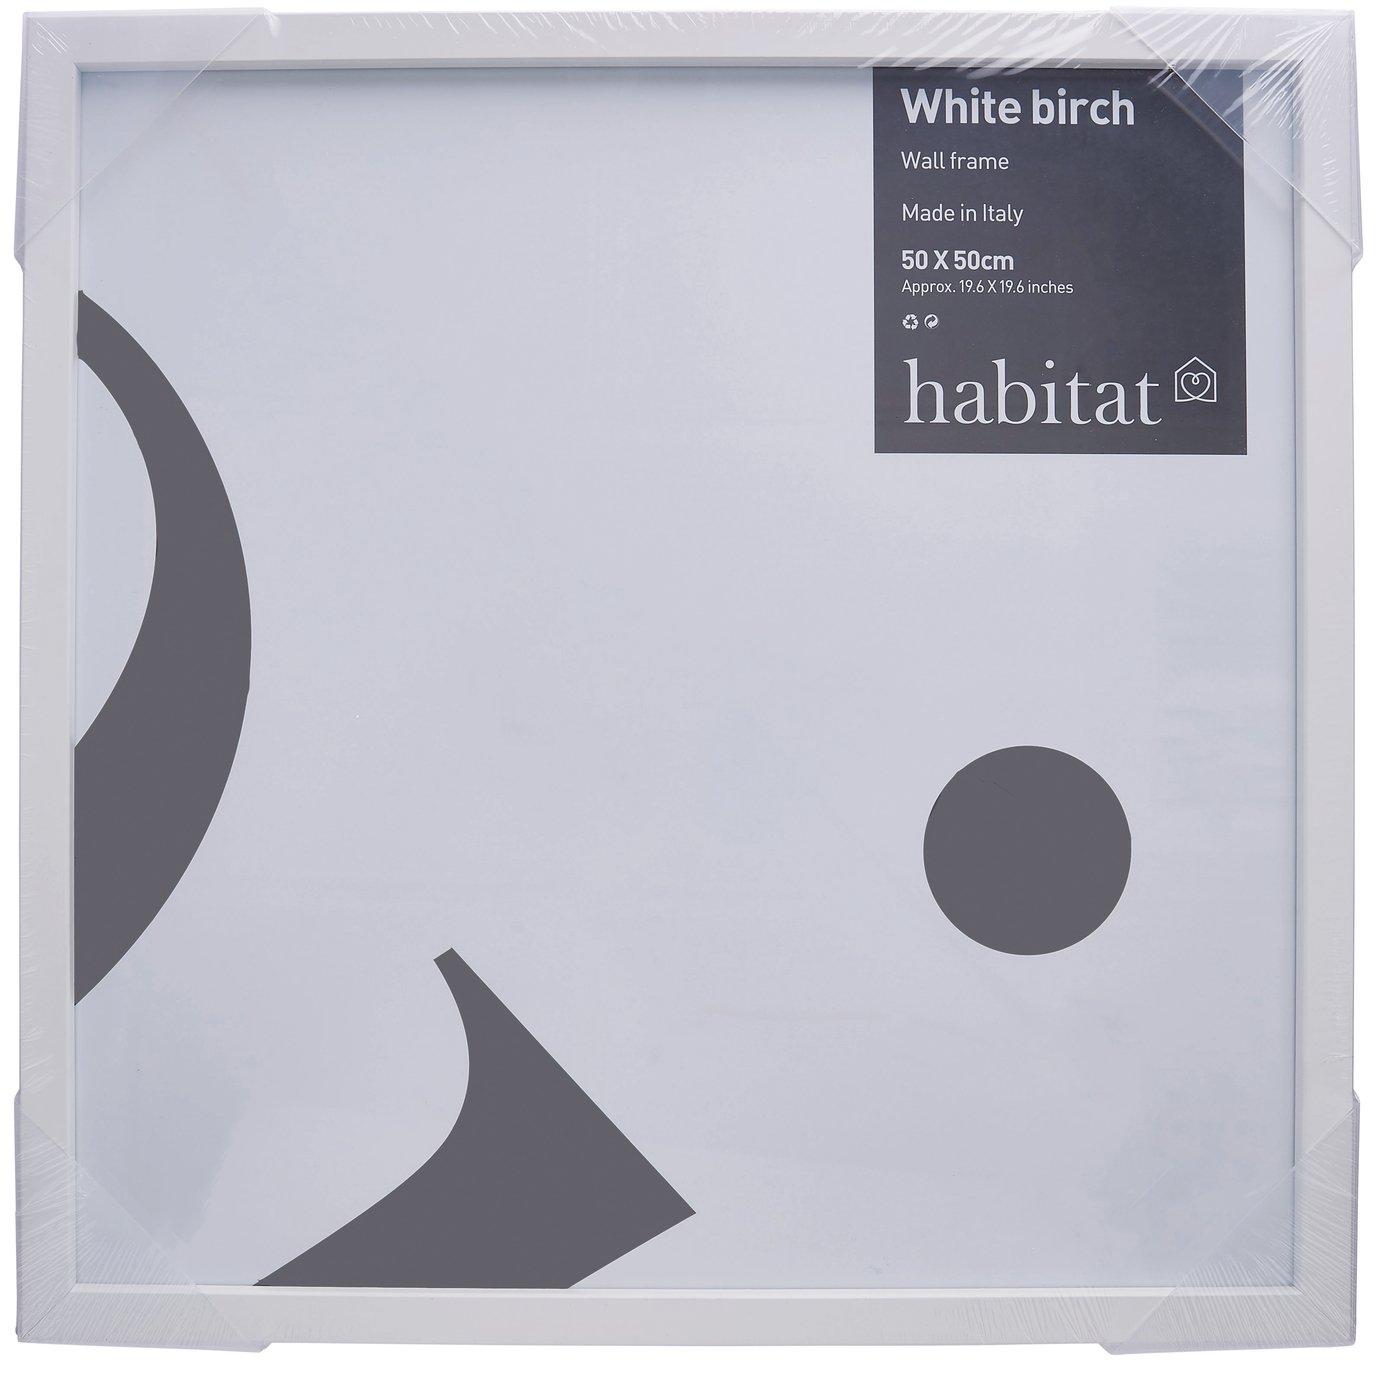 Image of Habitat 50x50cm Wall Frame - White Birch.